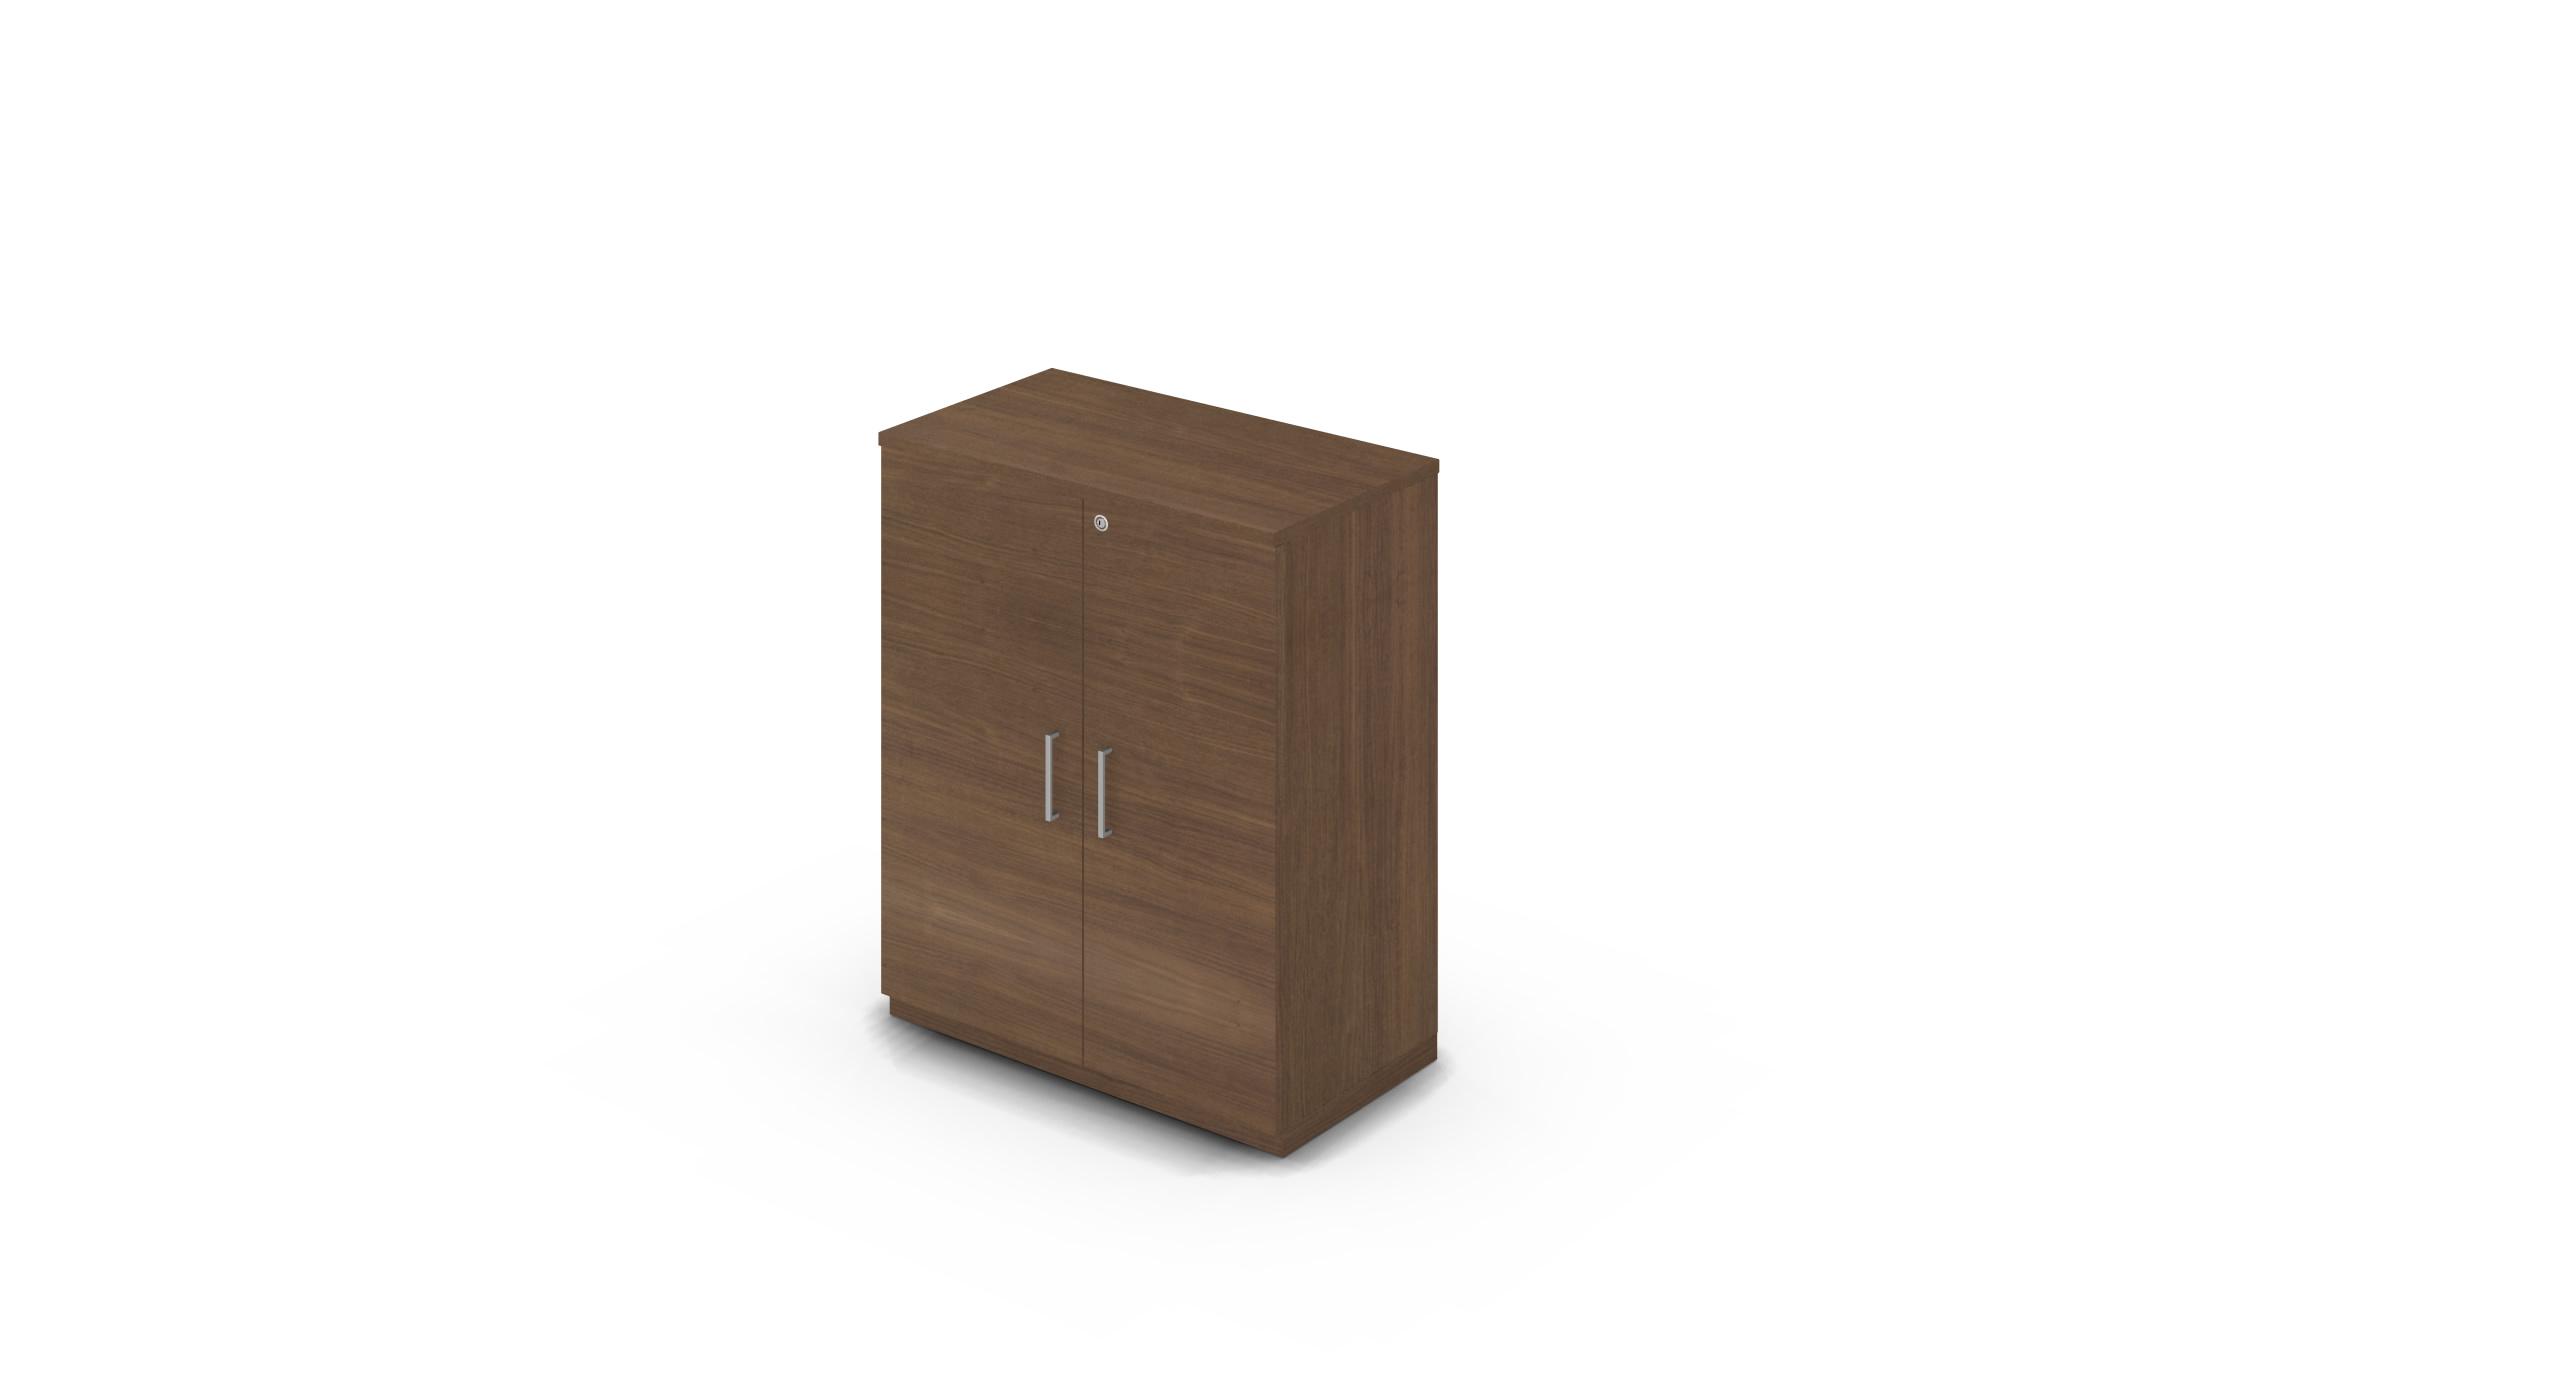 Cabinet_800x450x1125_HD_Walnut_Bar_Square_WithCylinder